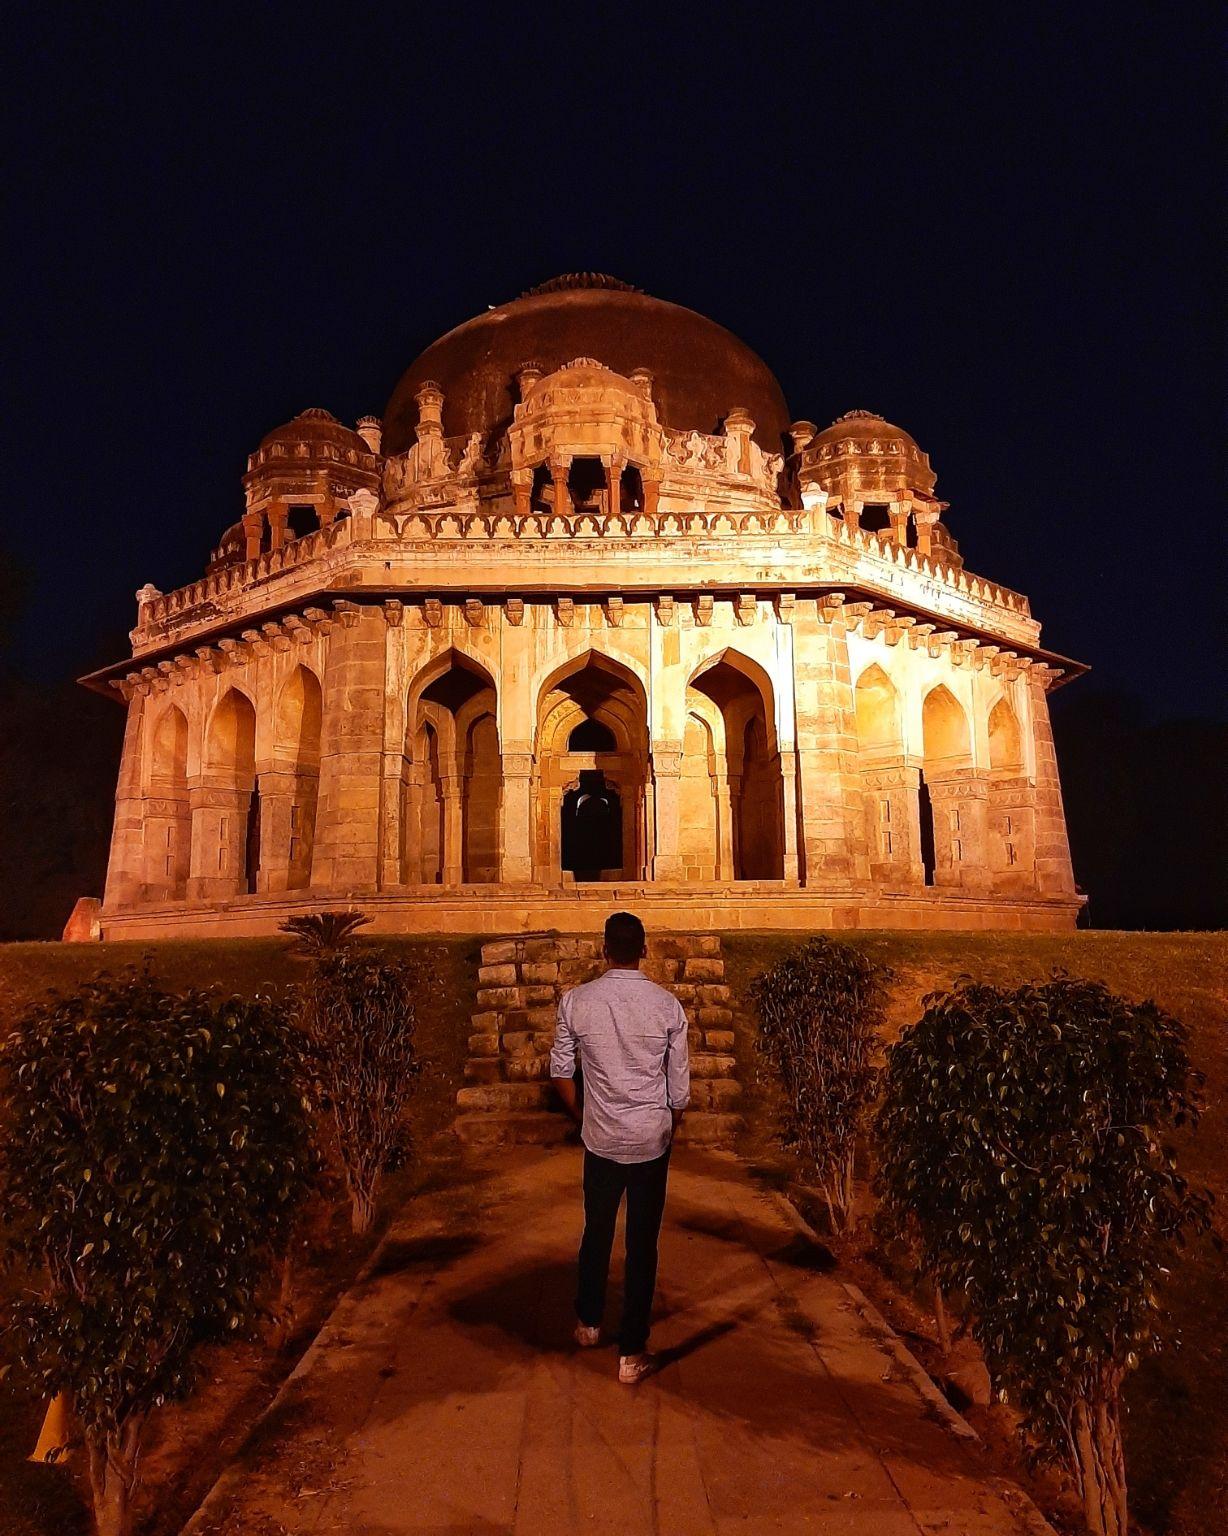 Photo of Lodi Garden By Deepak samal